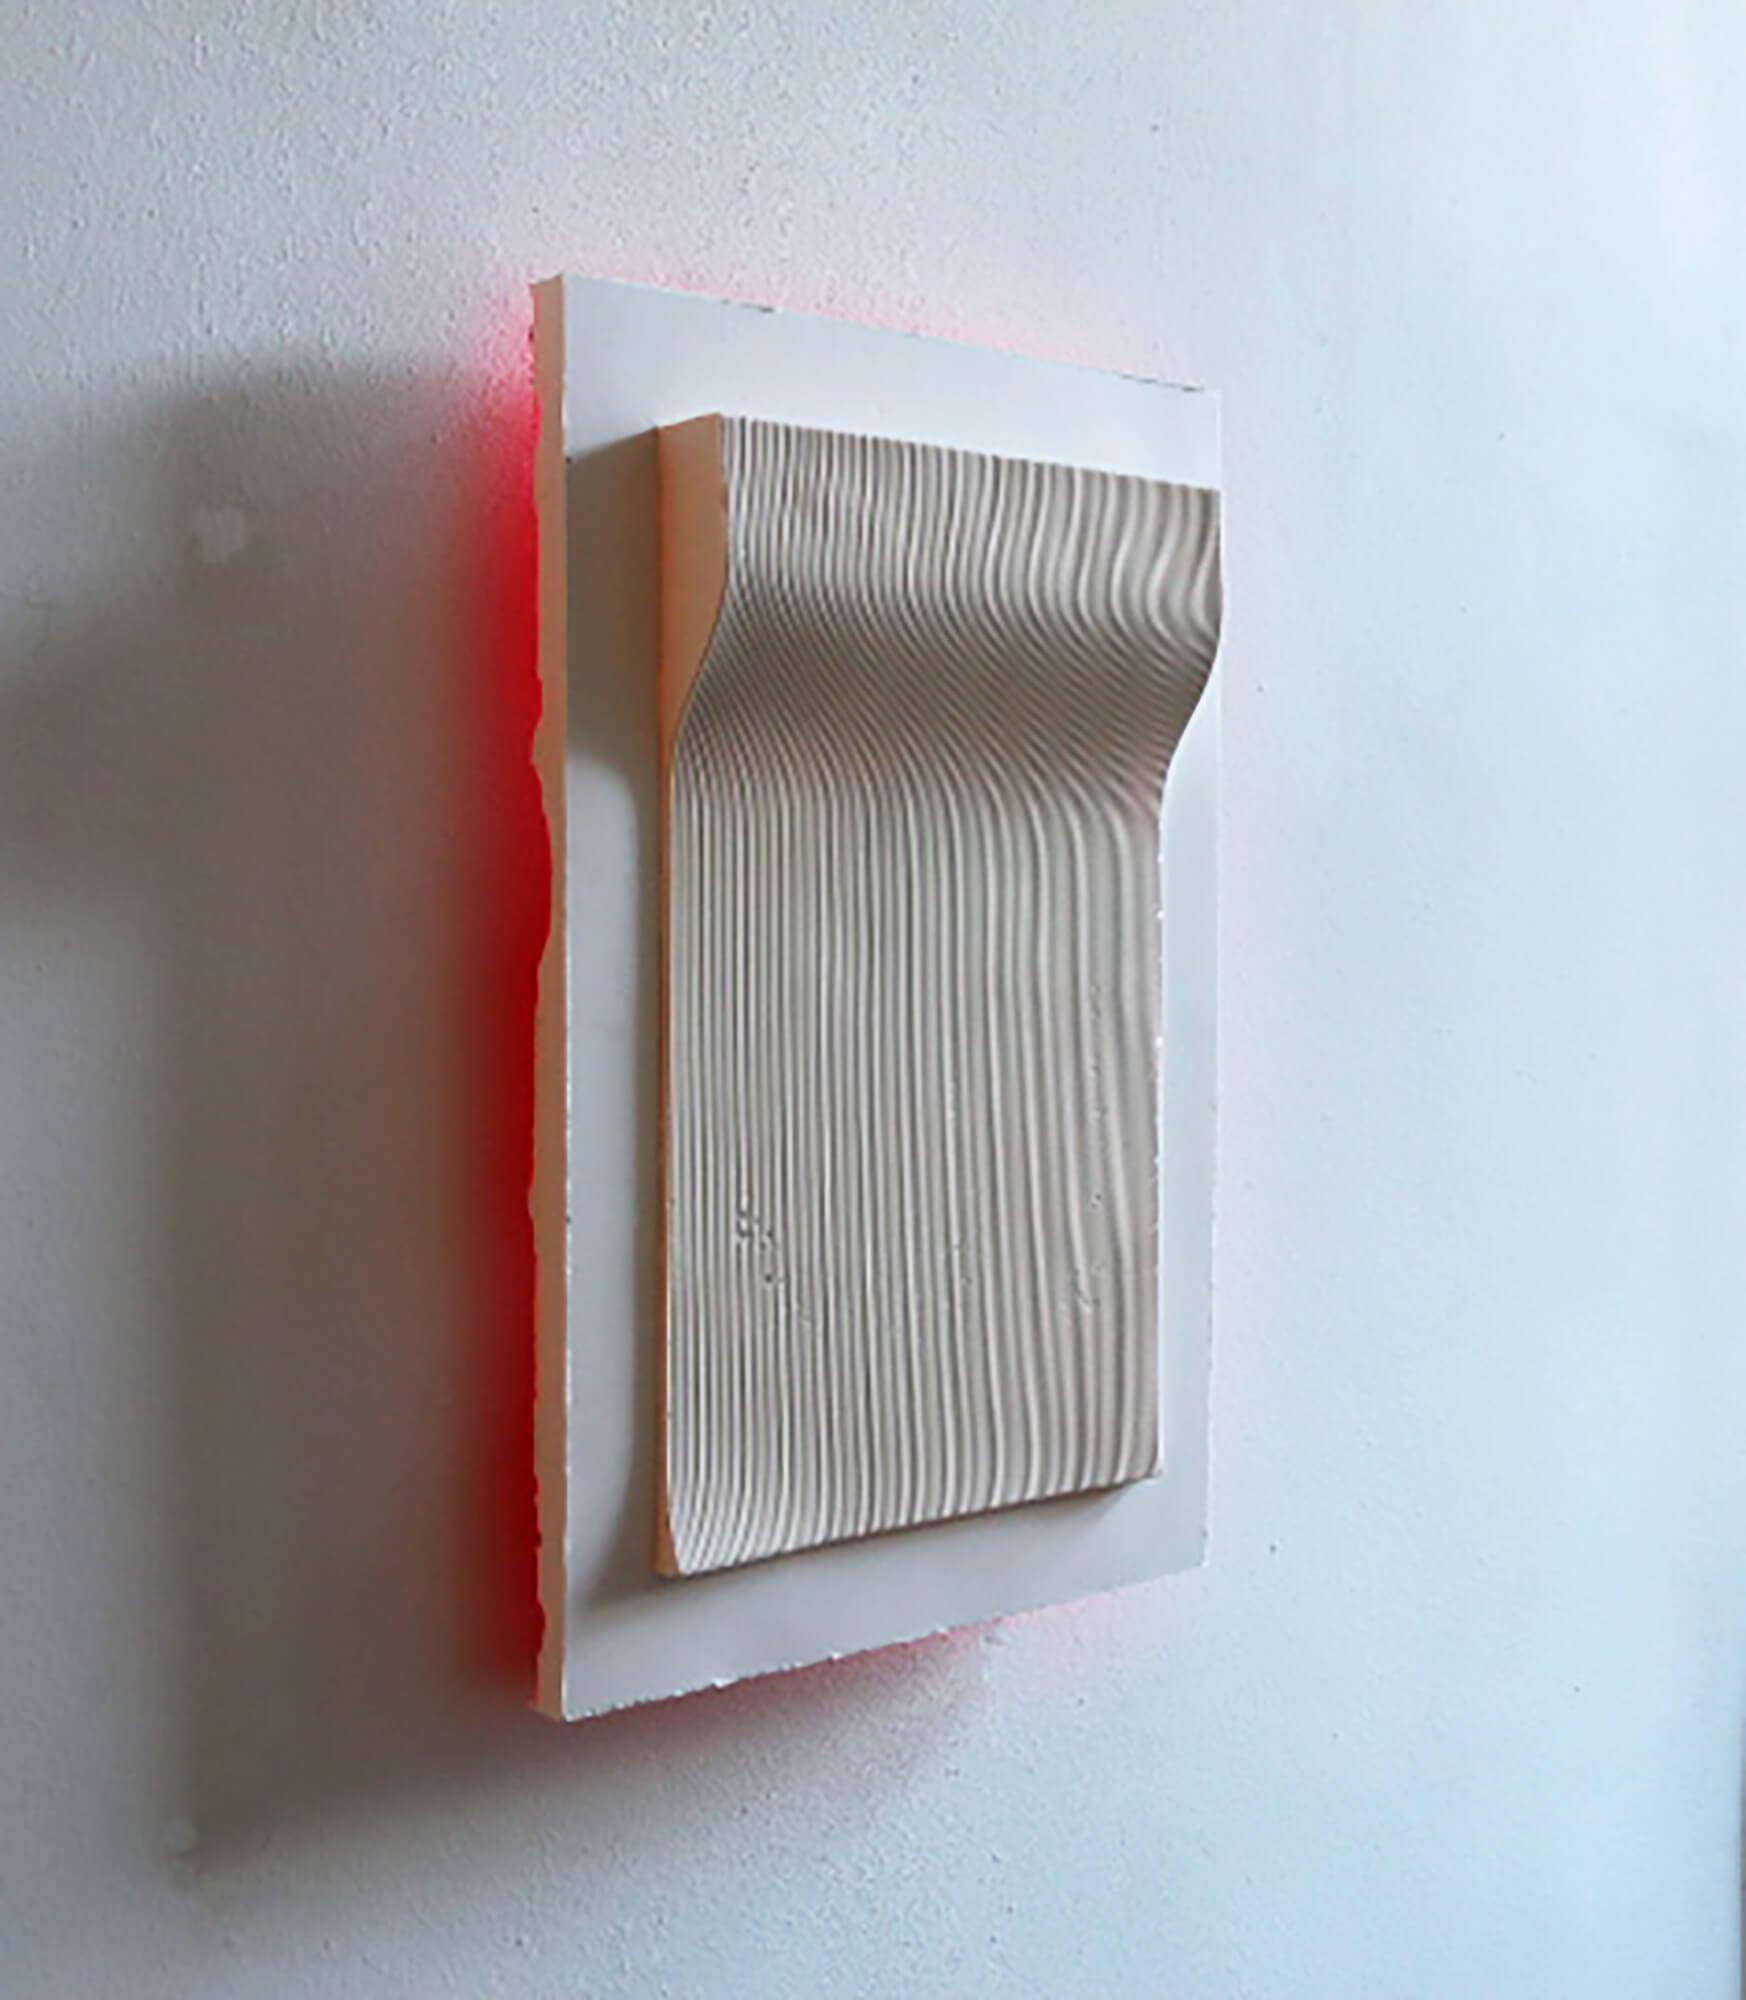 pinkstripe_Meenan_art_relief_sculpture_IMG_2159.jpg